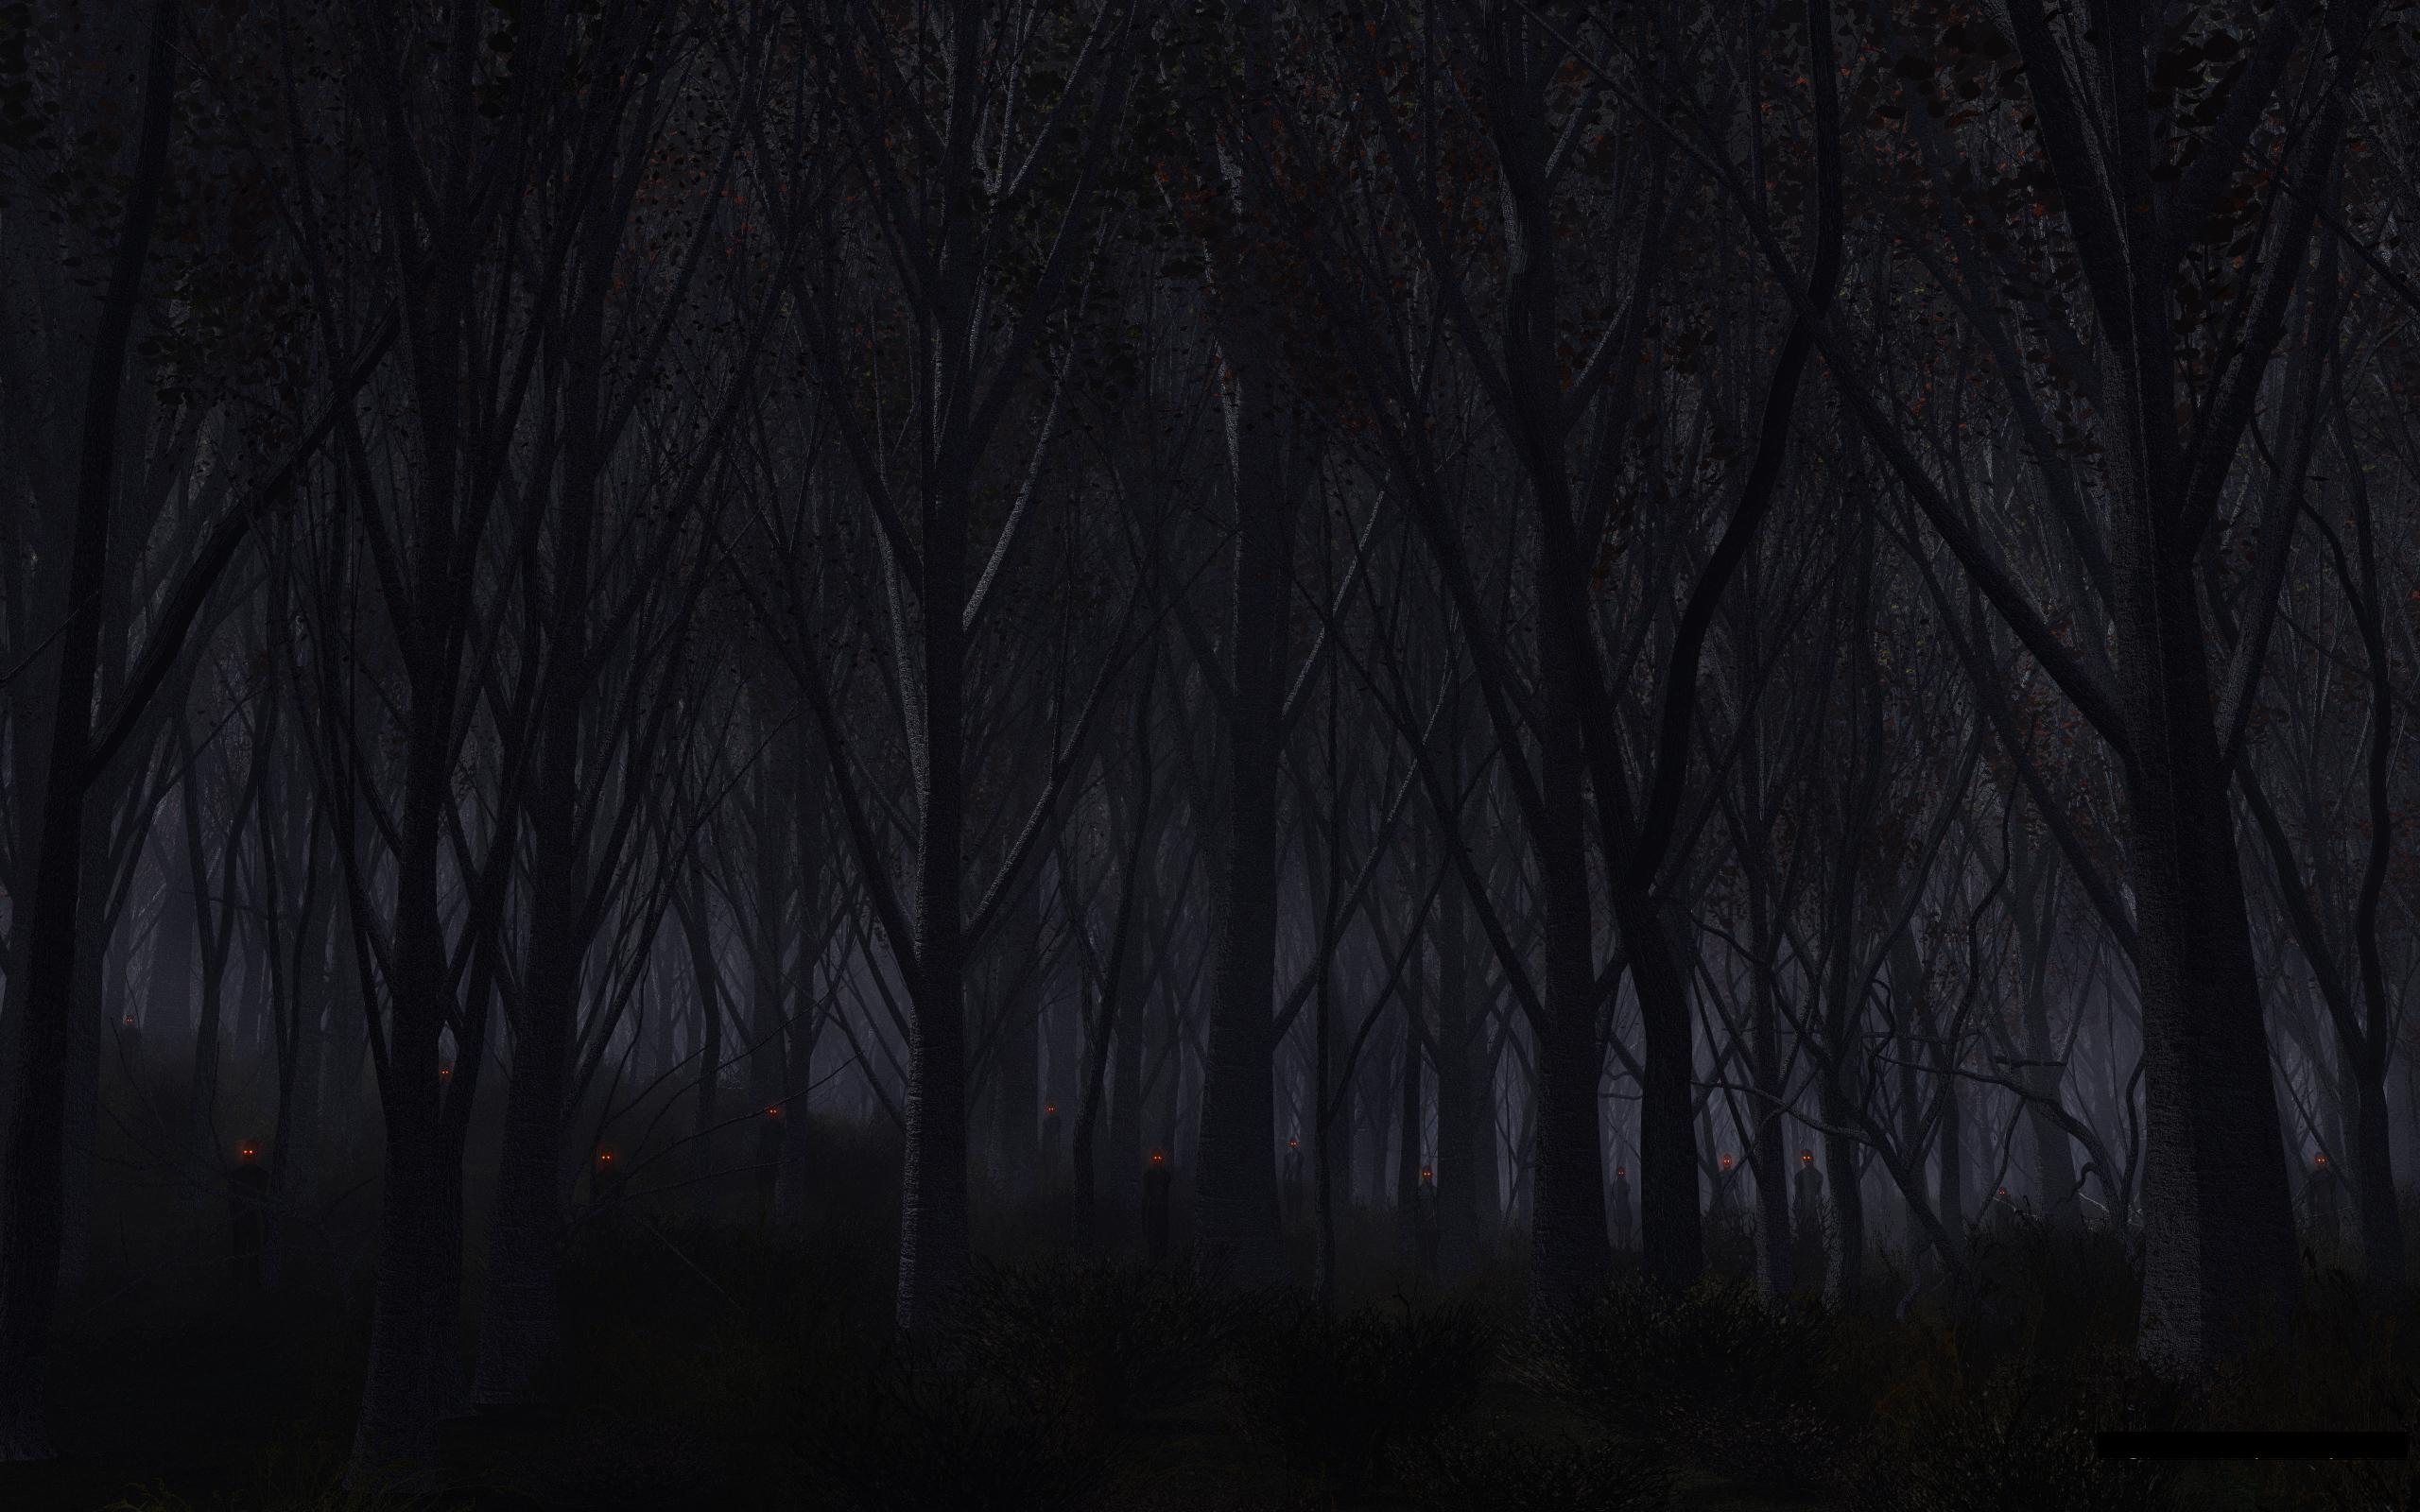 Forest Trees Night Creepy demons creature monsters evil dark wallpaper .